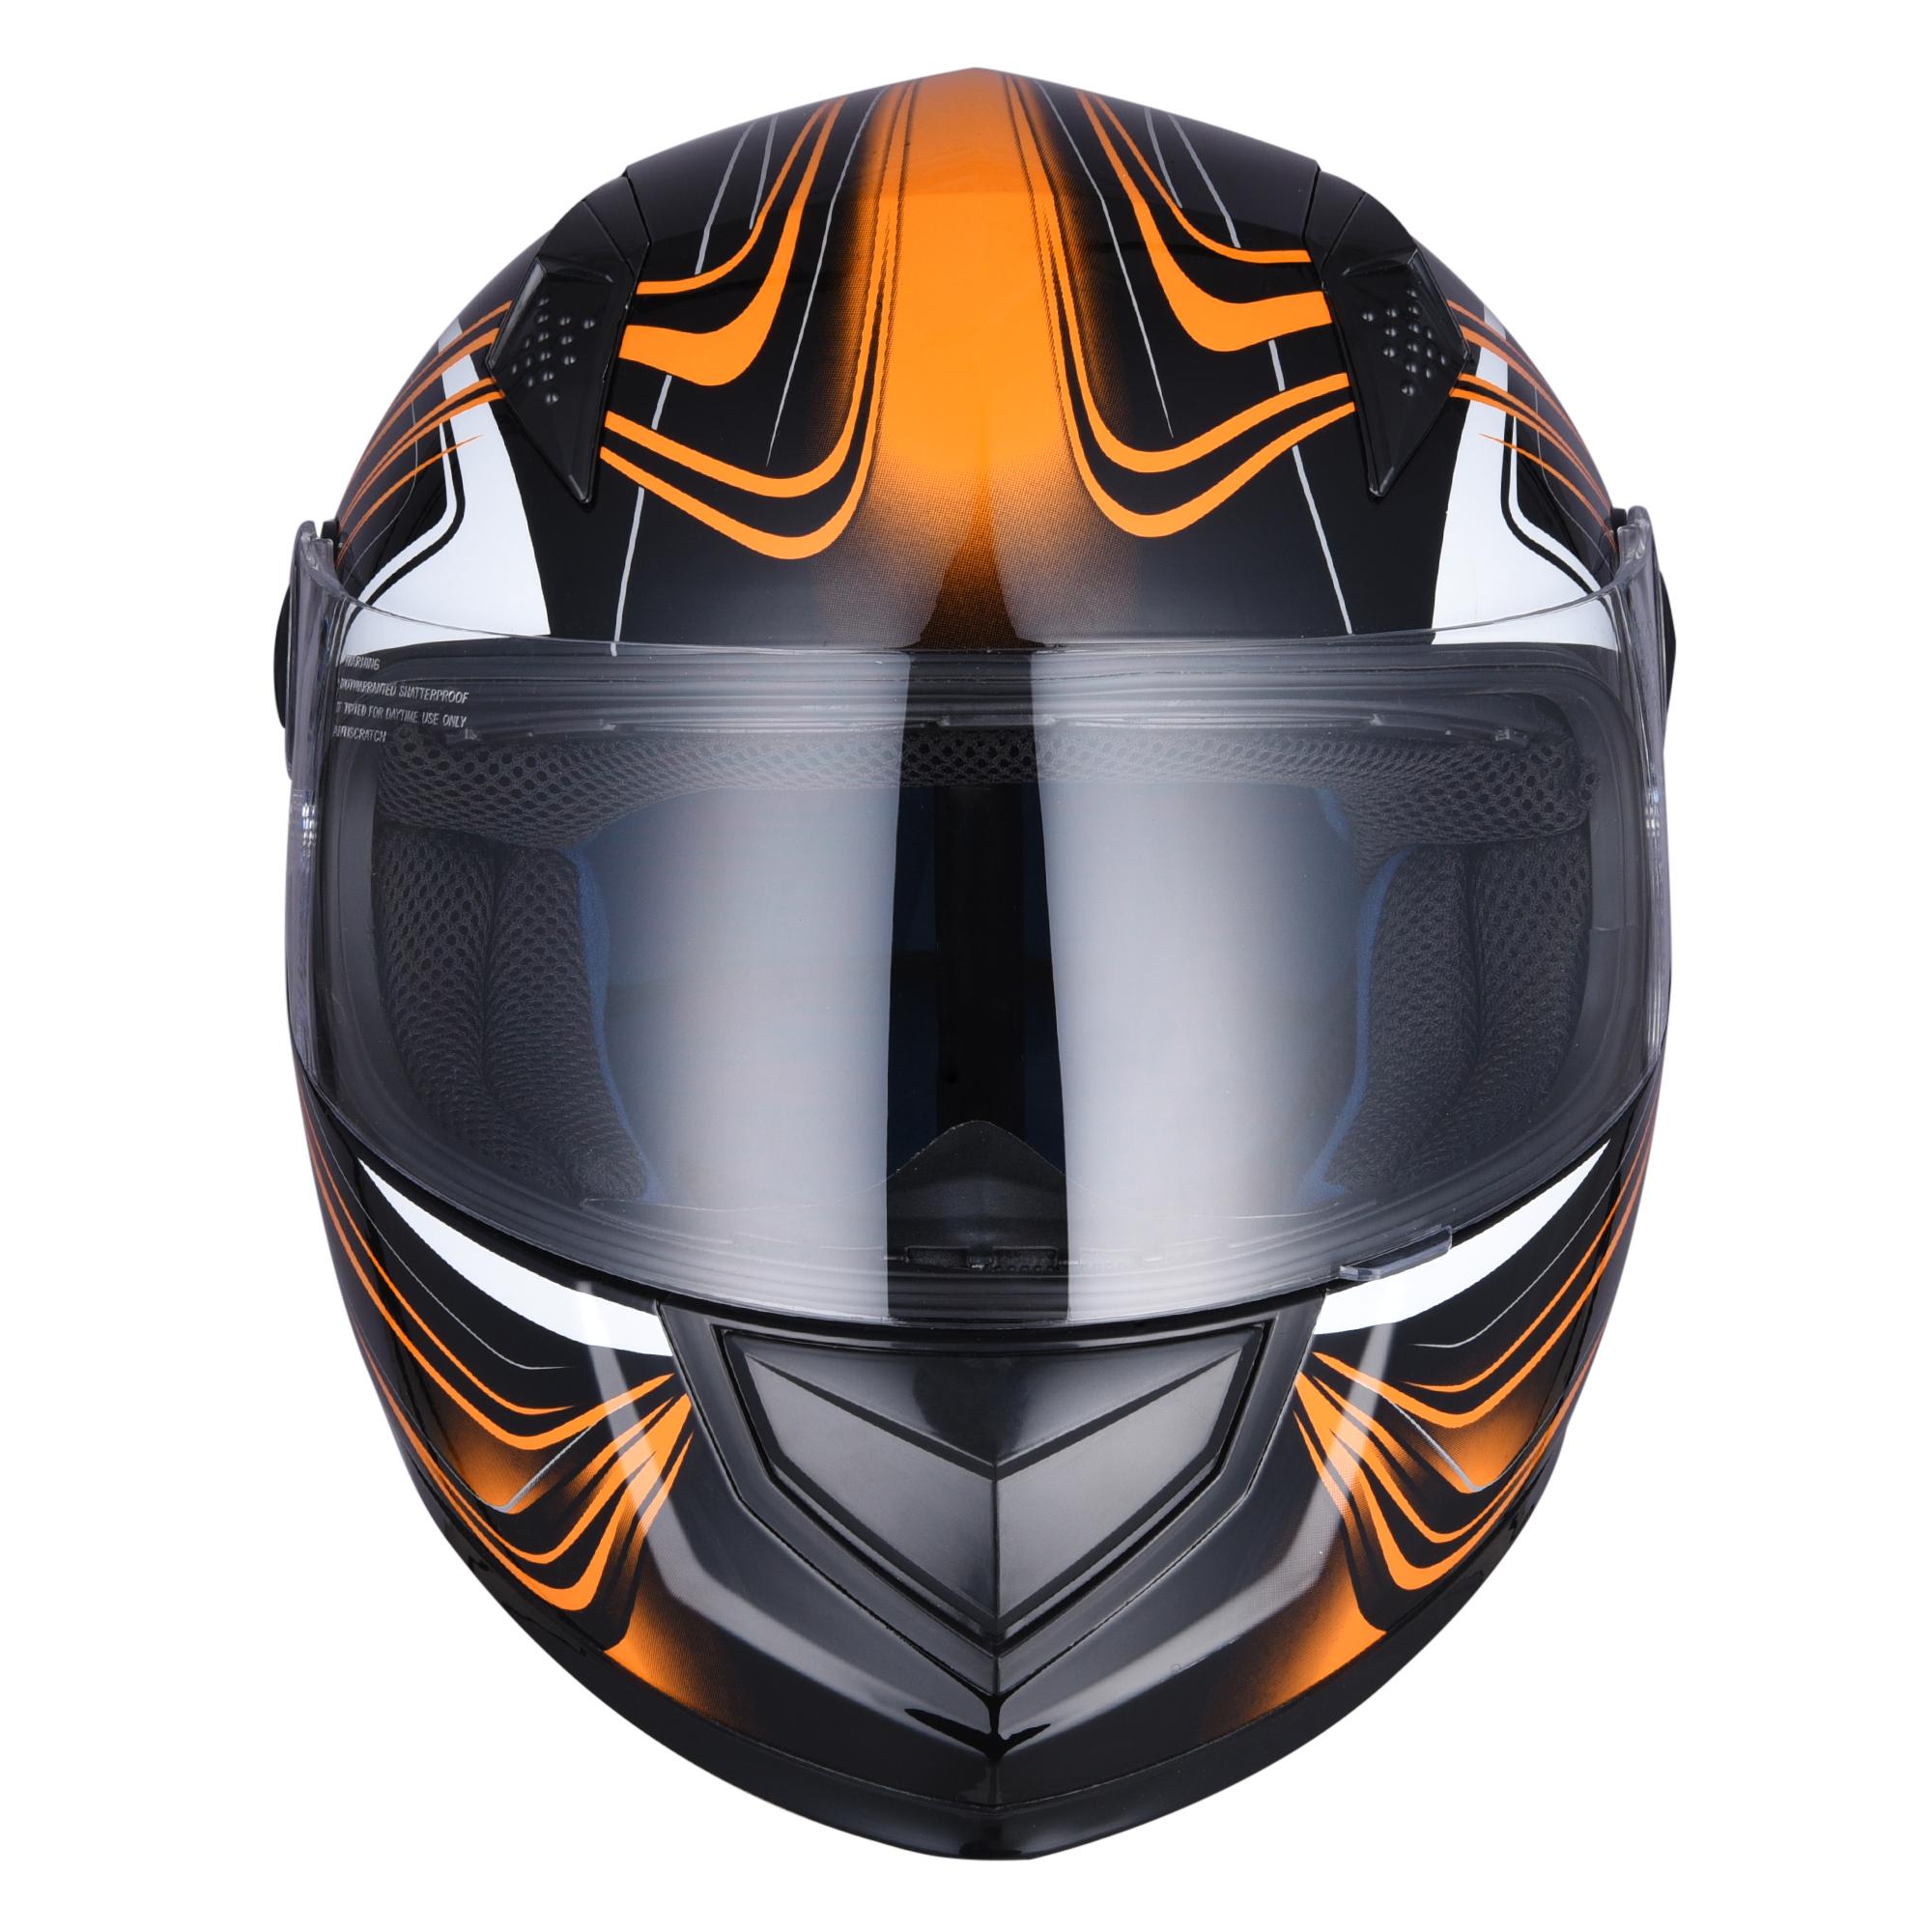 miniature 109 - AHR K12 Full Face Motorcycle Helmet DOT Air Vents Clear Visor Racing S M L XL